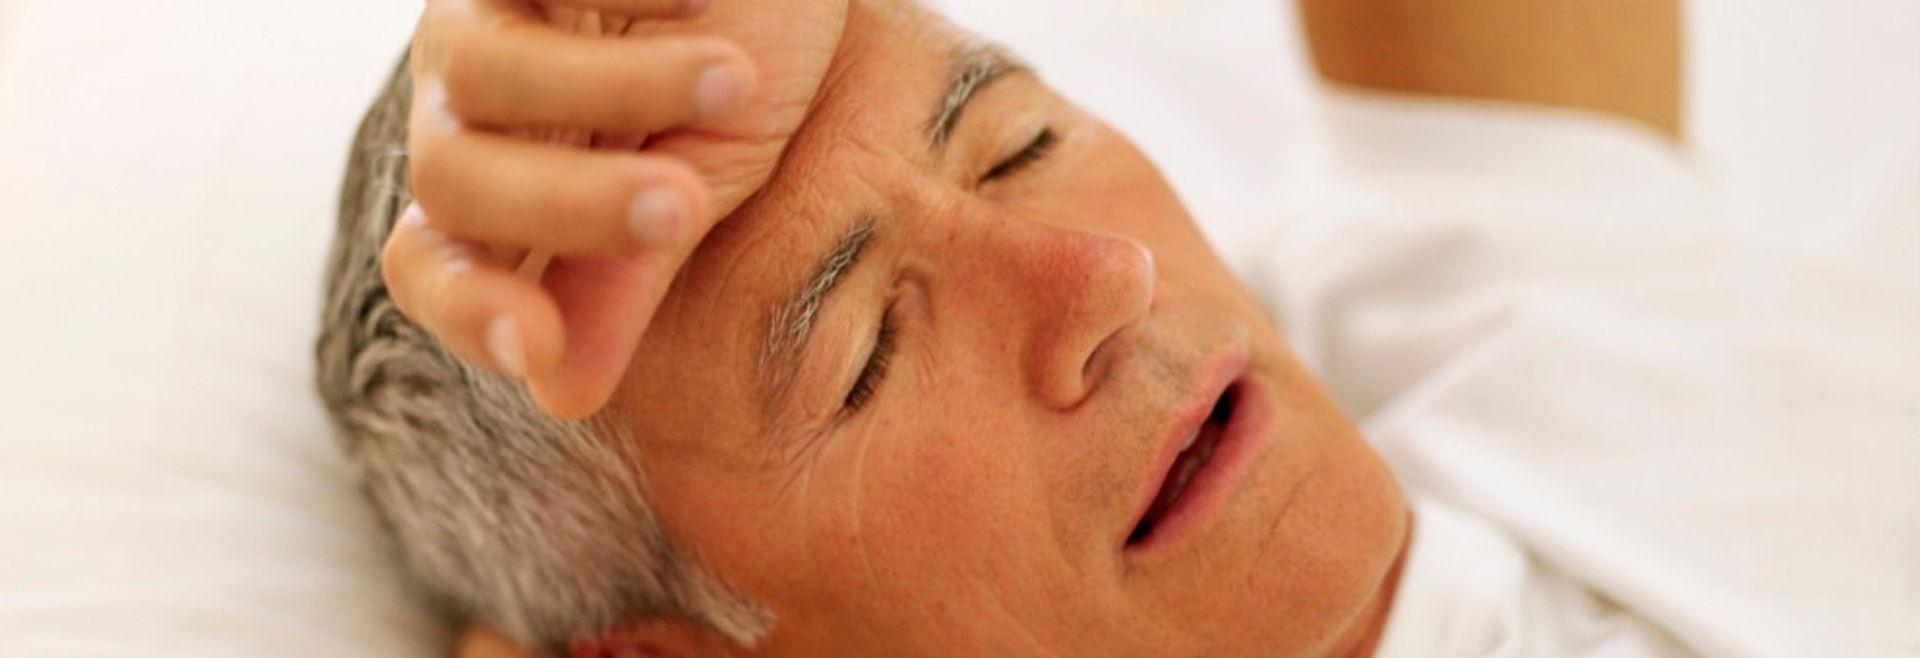 Sleep Apnea: Signs & Symptoms